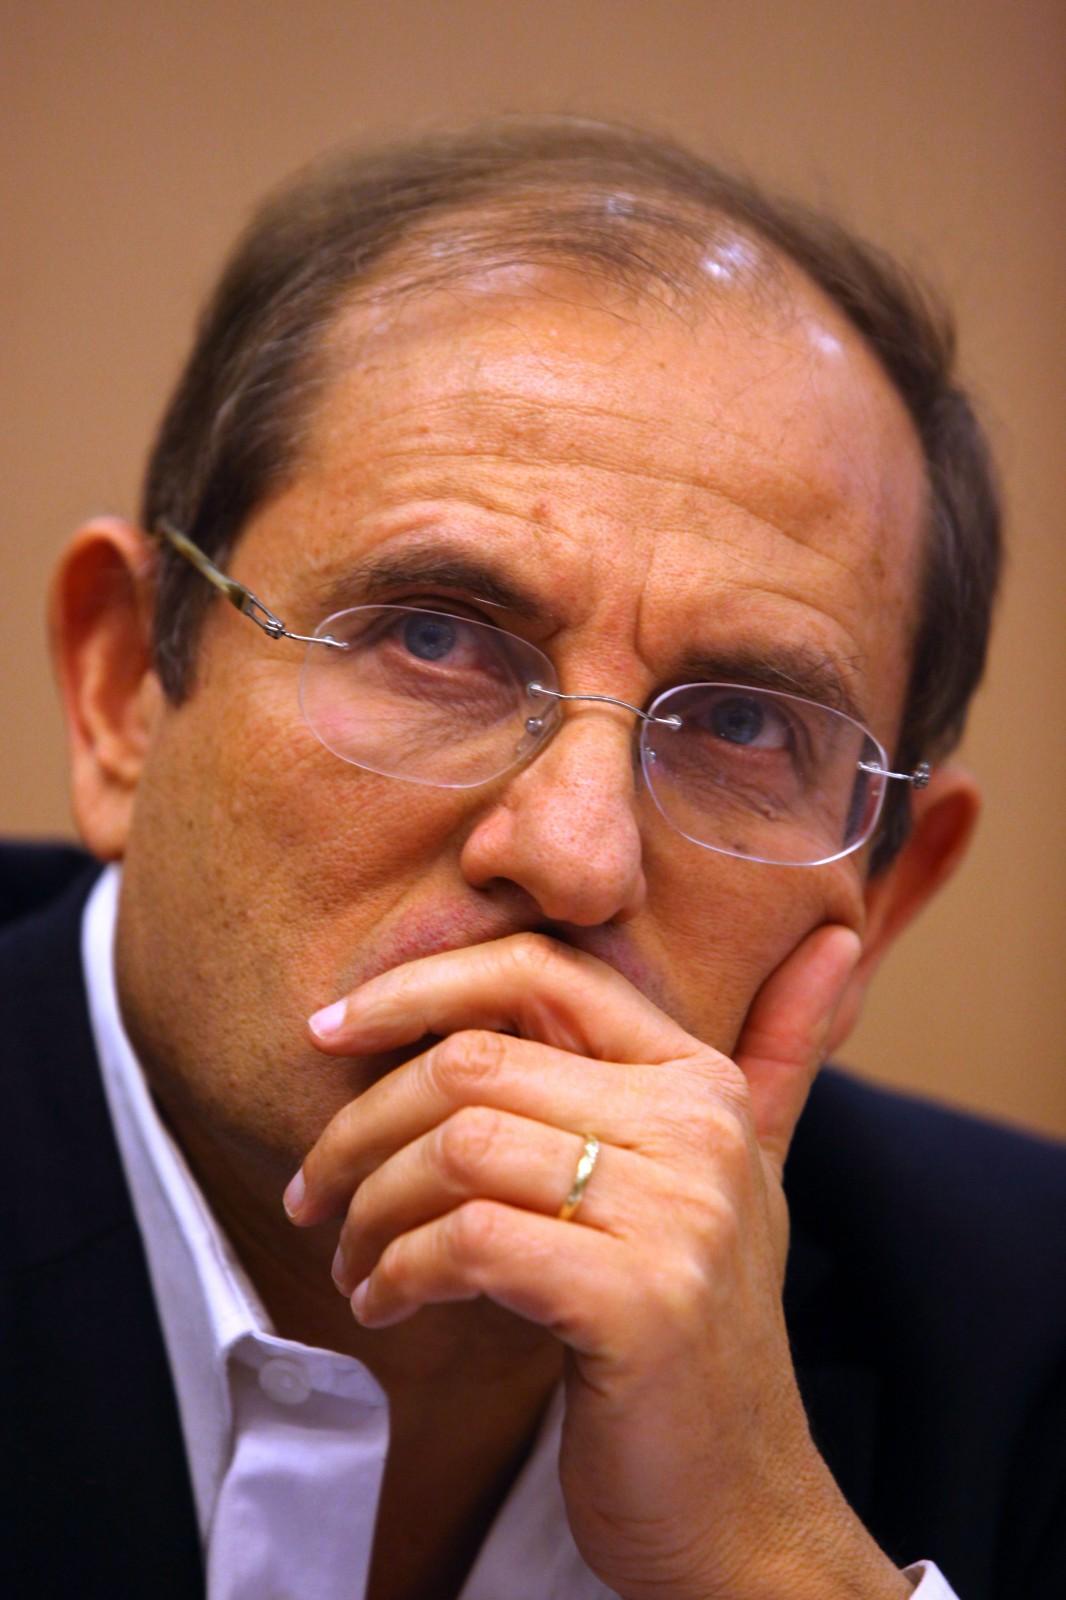 פרופ' קרמניצר (צילום: קובי גדעון)